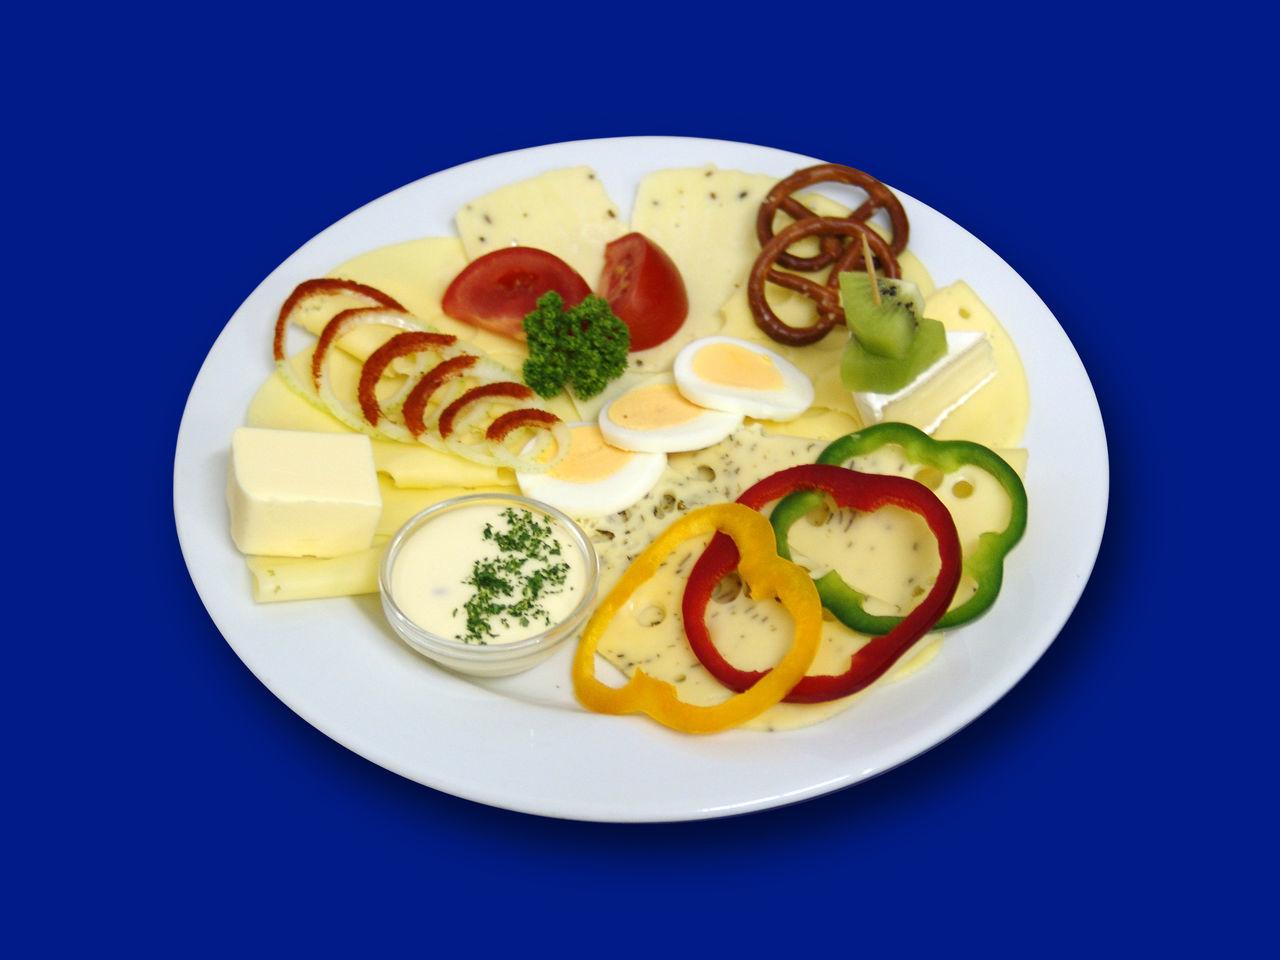 Abendbrot Butterfly Eier Essen Food Foodphotography Freshness Käse No People Plate Teller Wurst